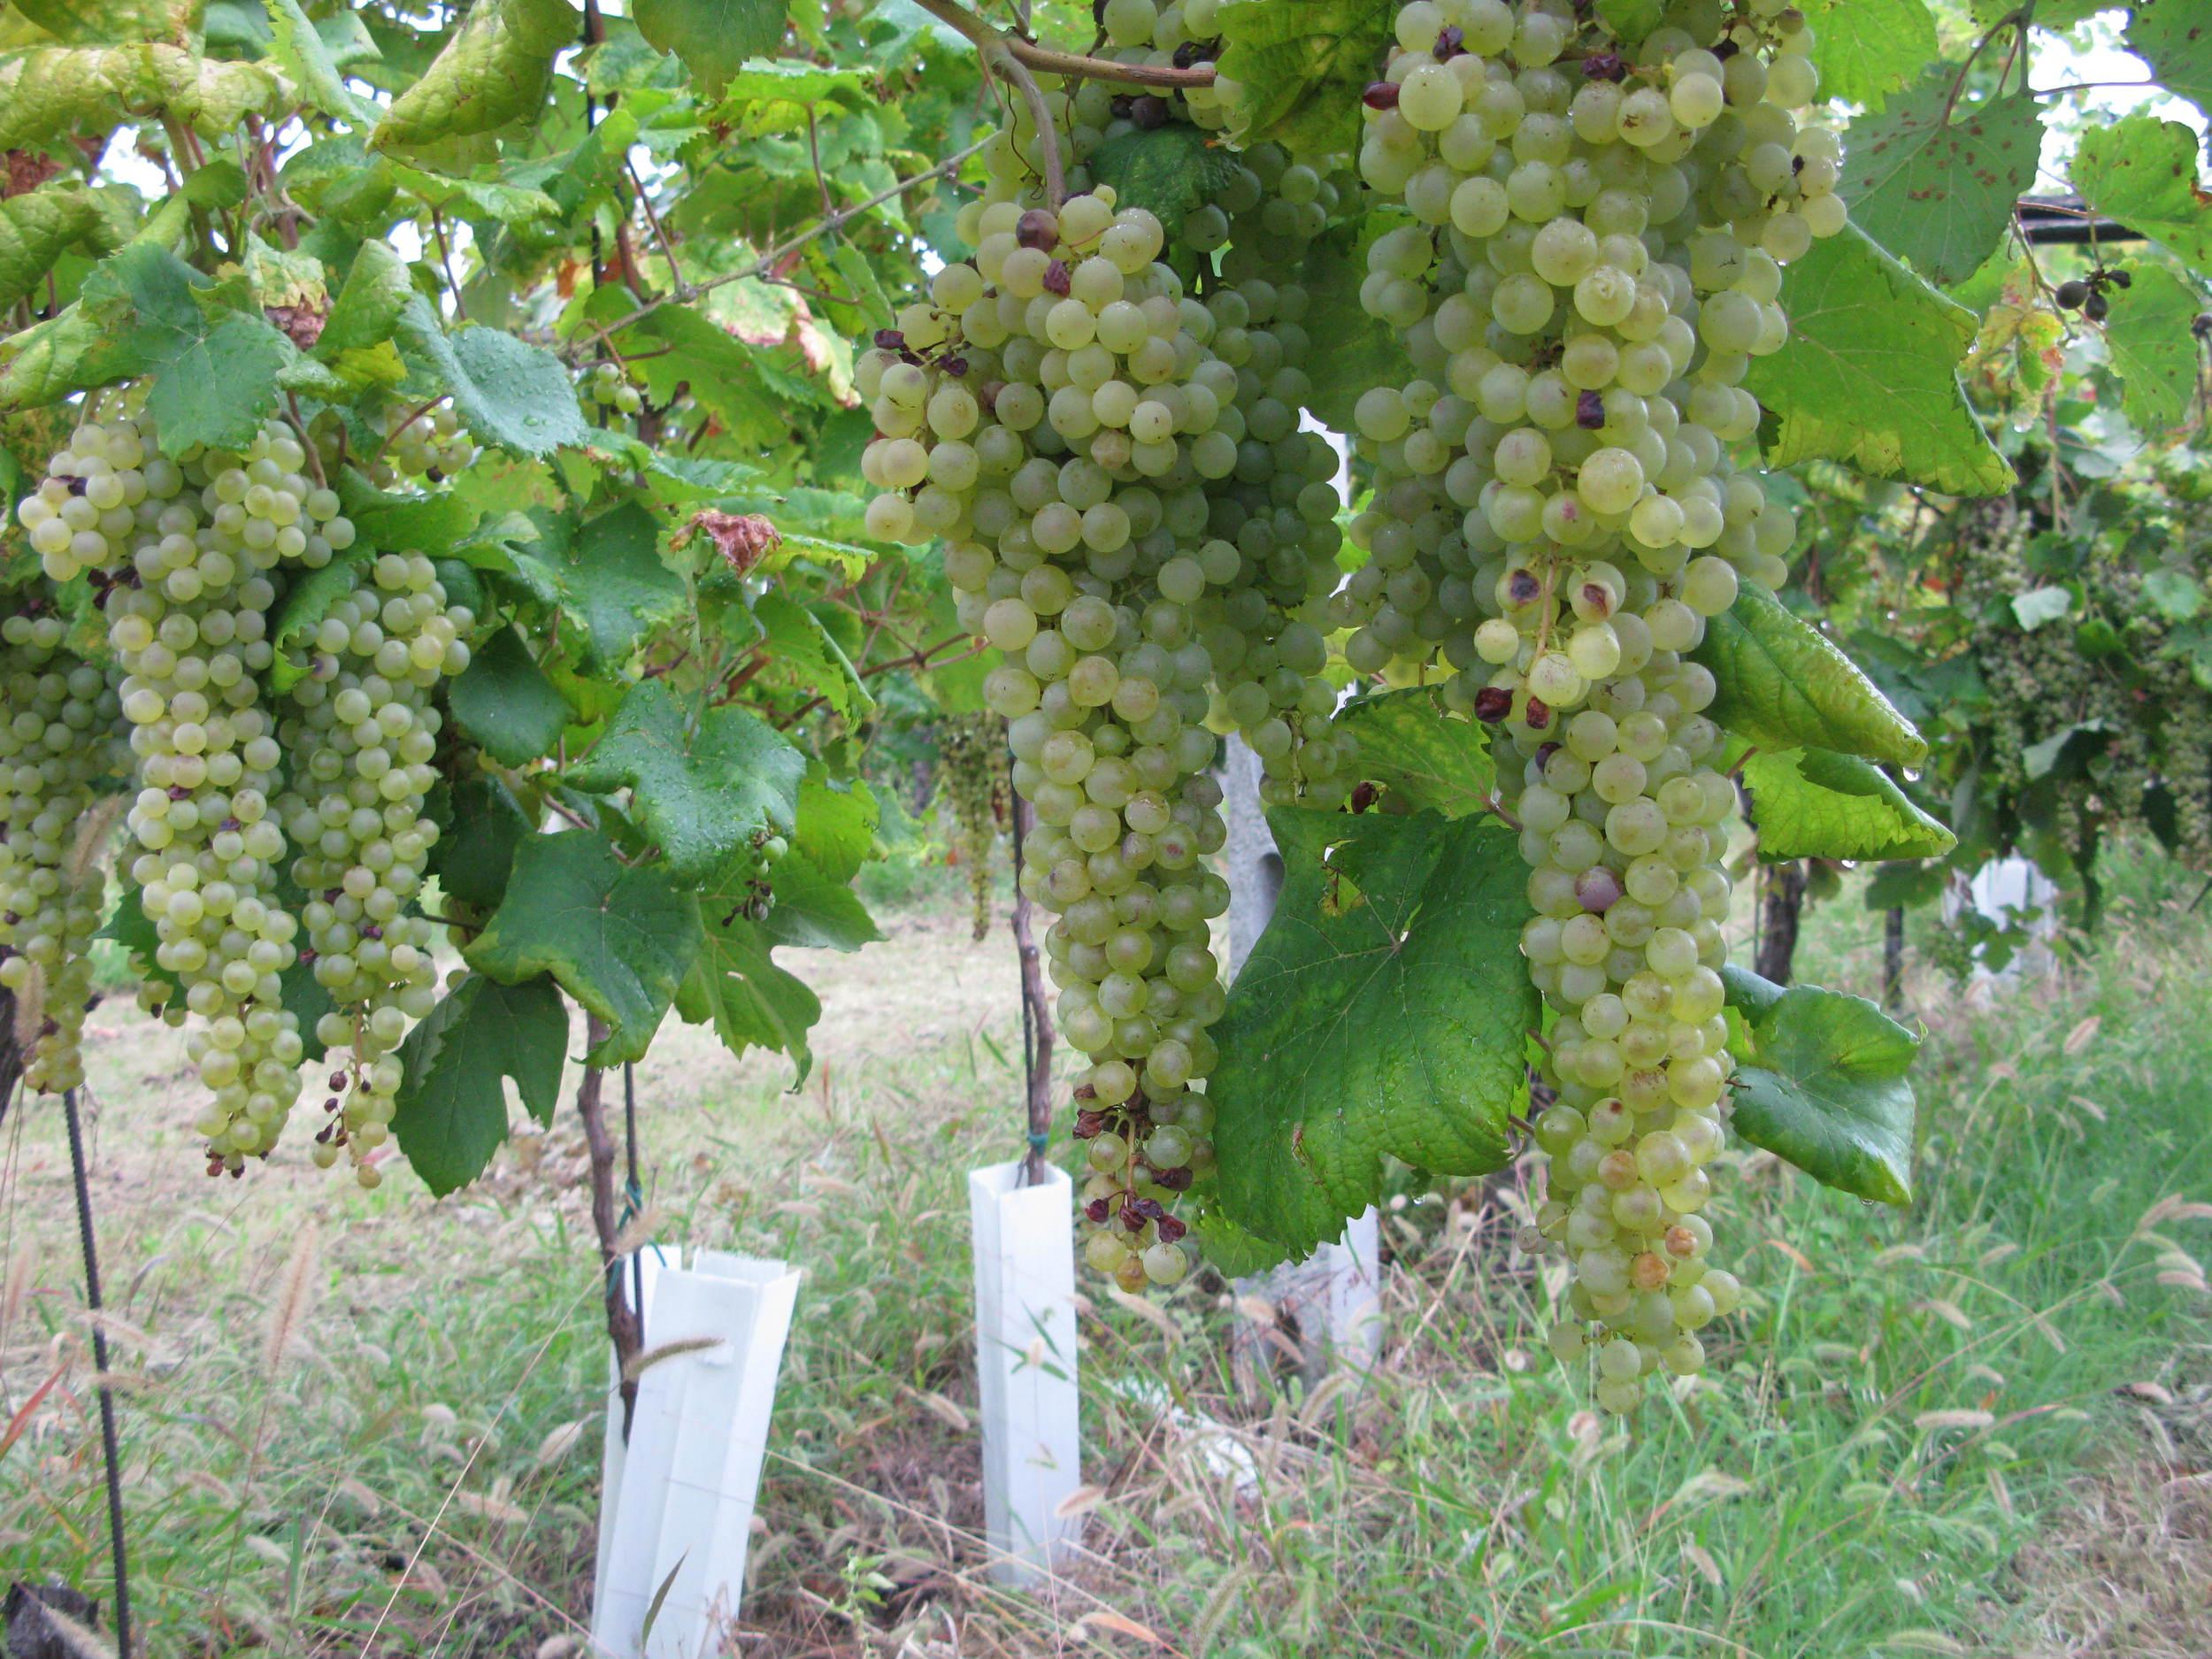 The distinctive Albana grape variety